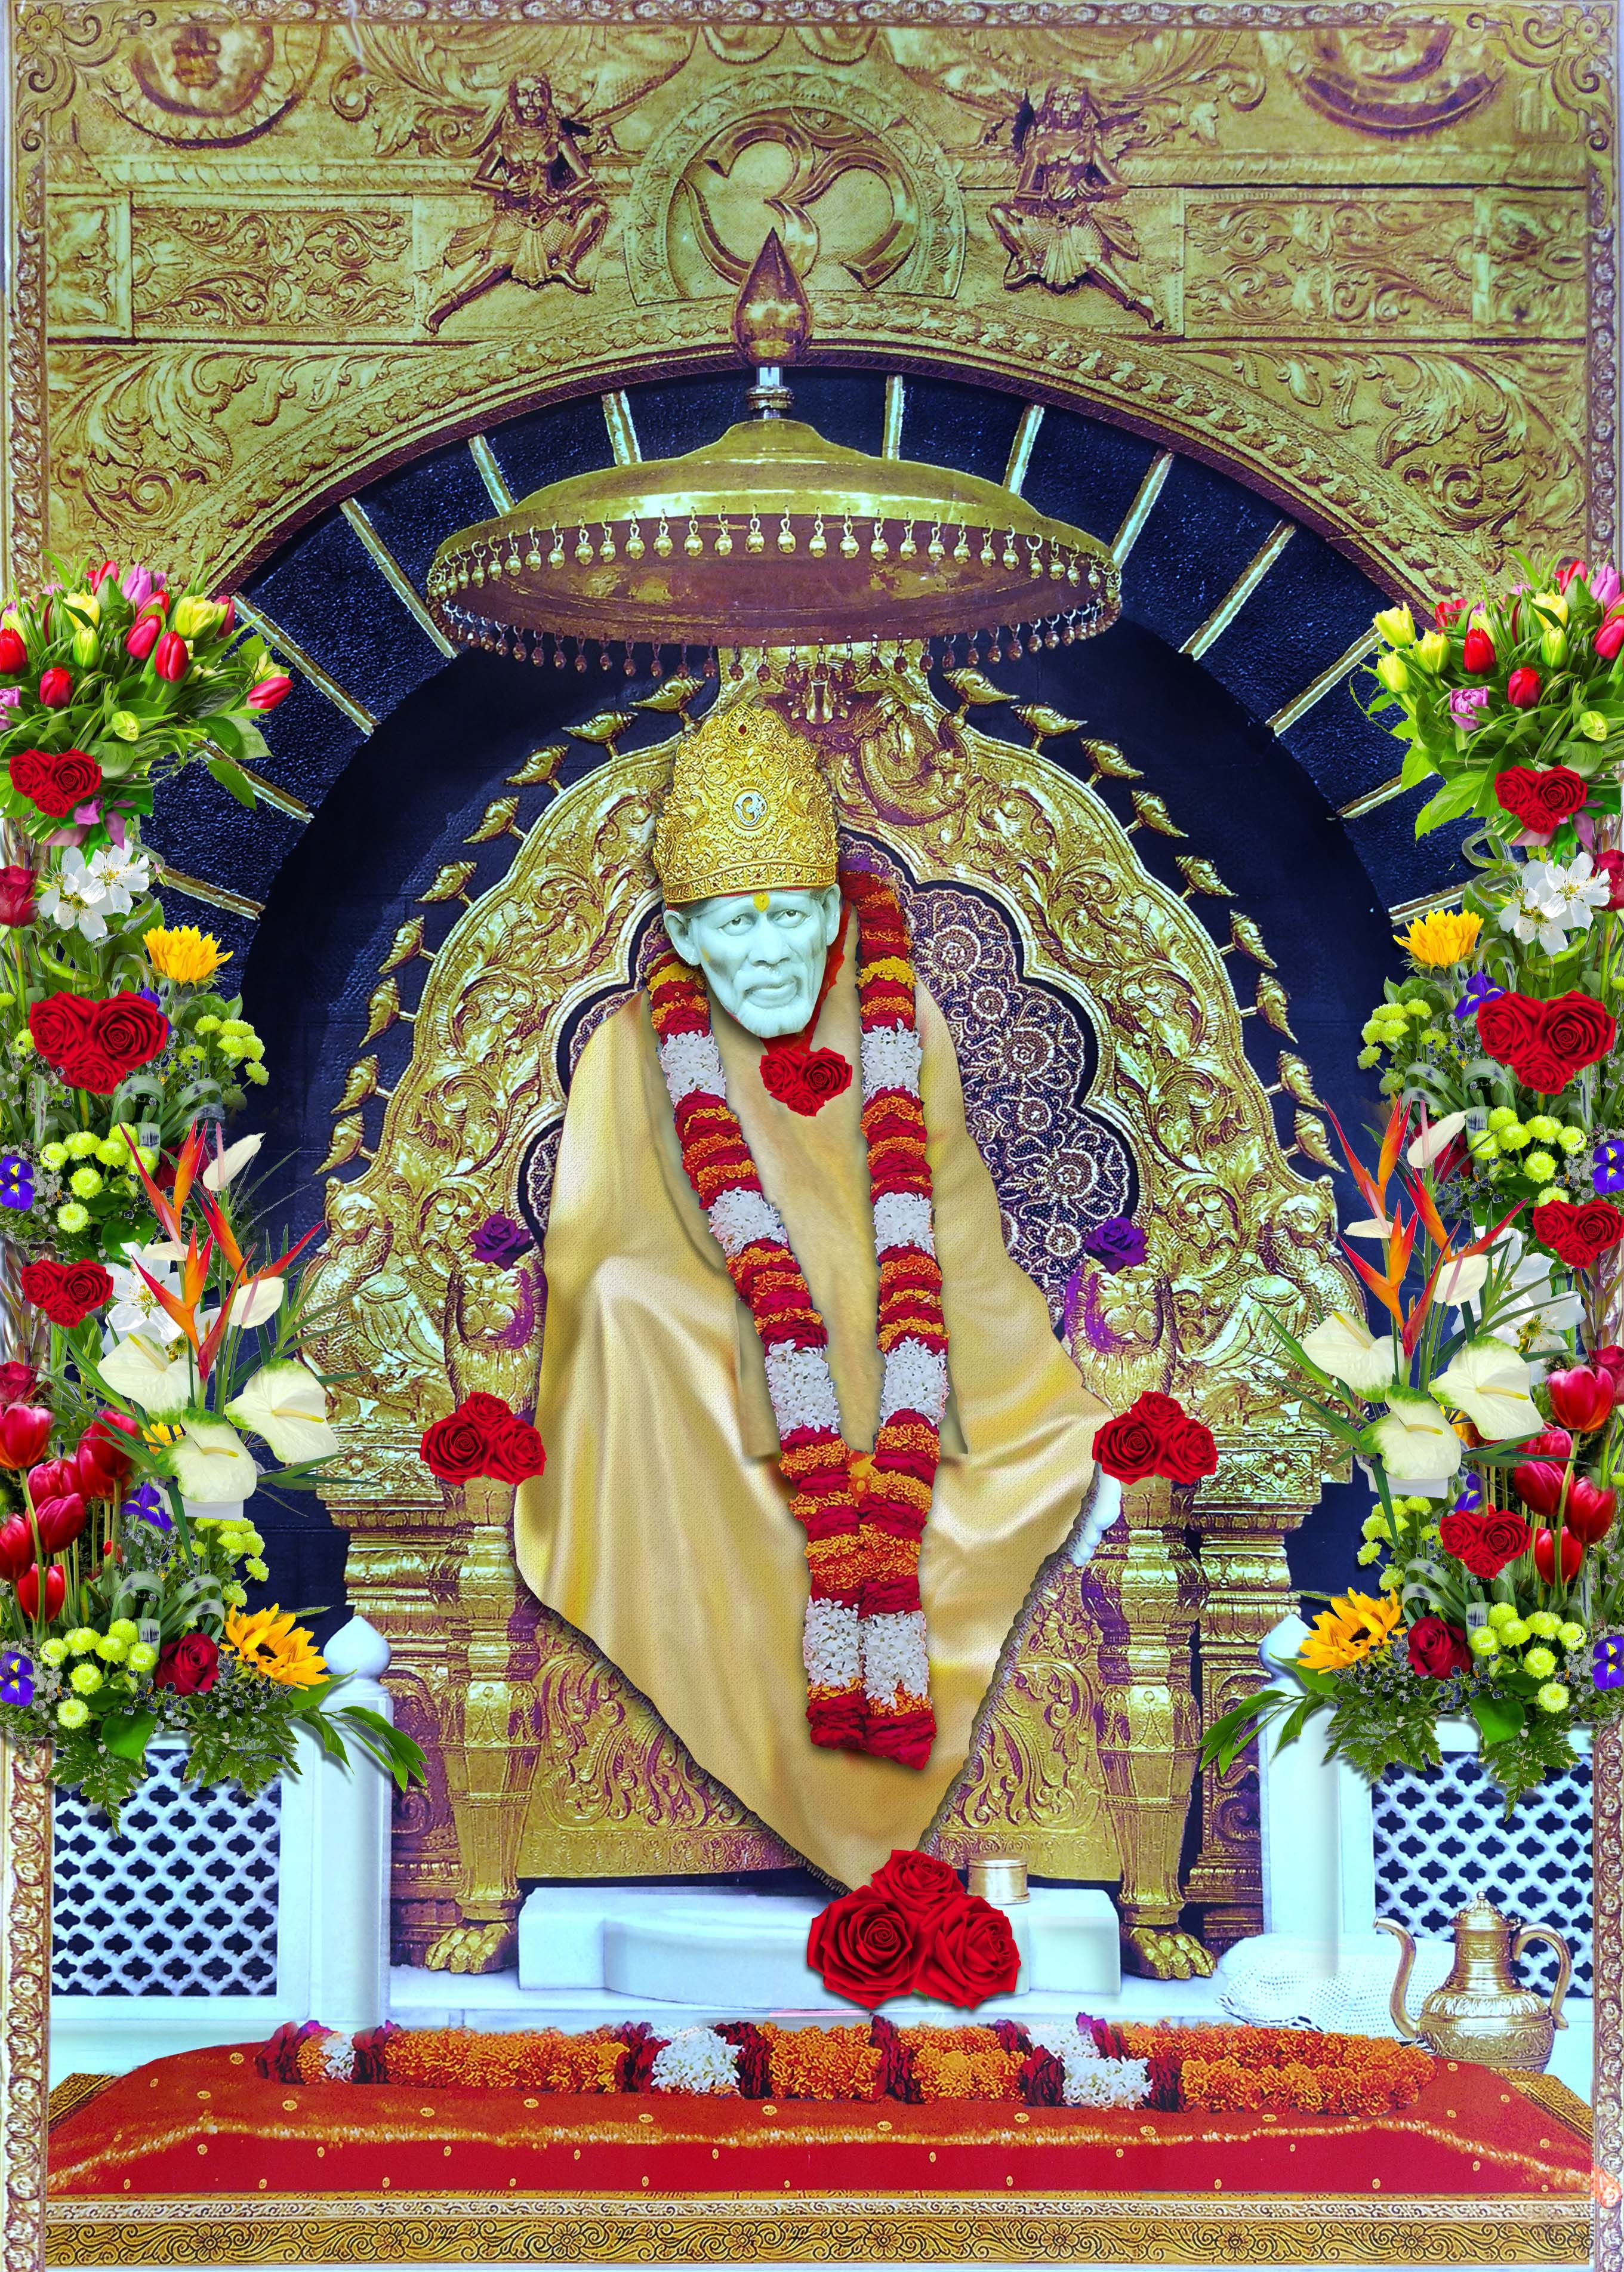 Om Sai Ram Wallpaper With Quotes Bhagwan Ji Help Me Sai Baba